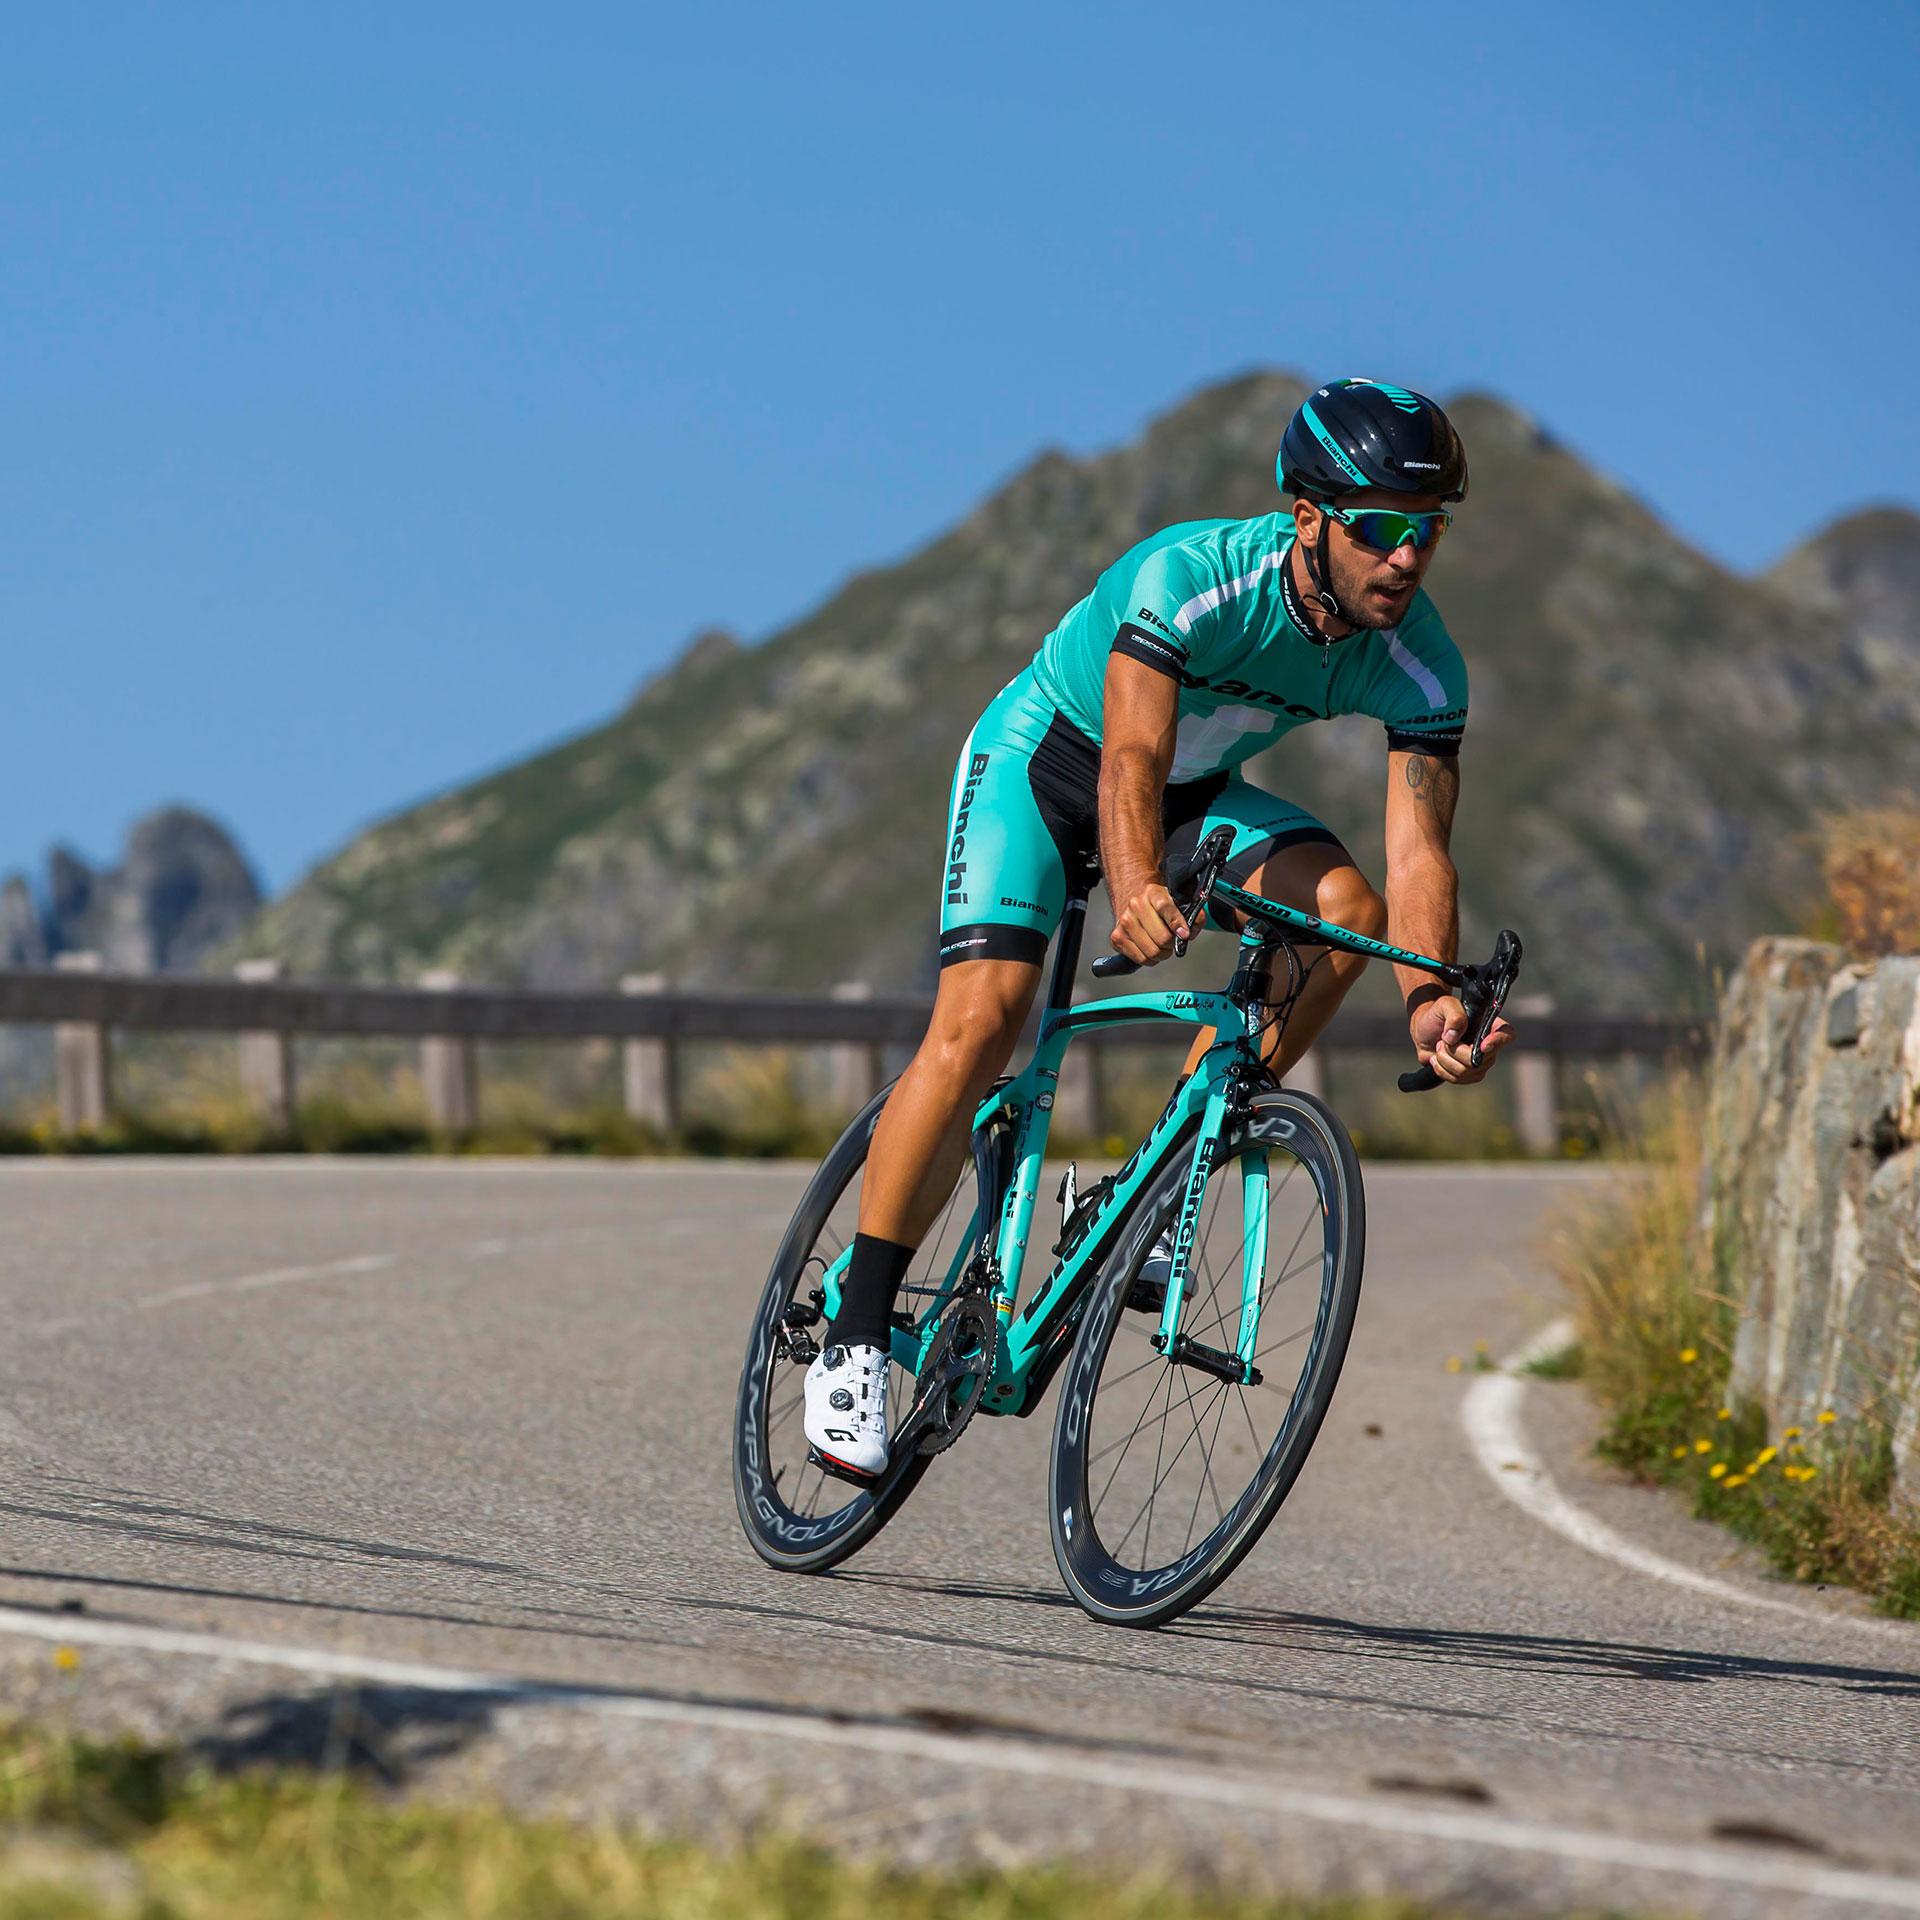 Bianchi Oltre XR4 Road Bike